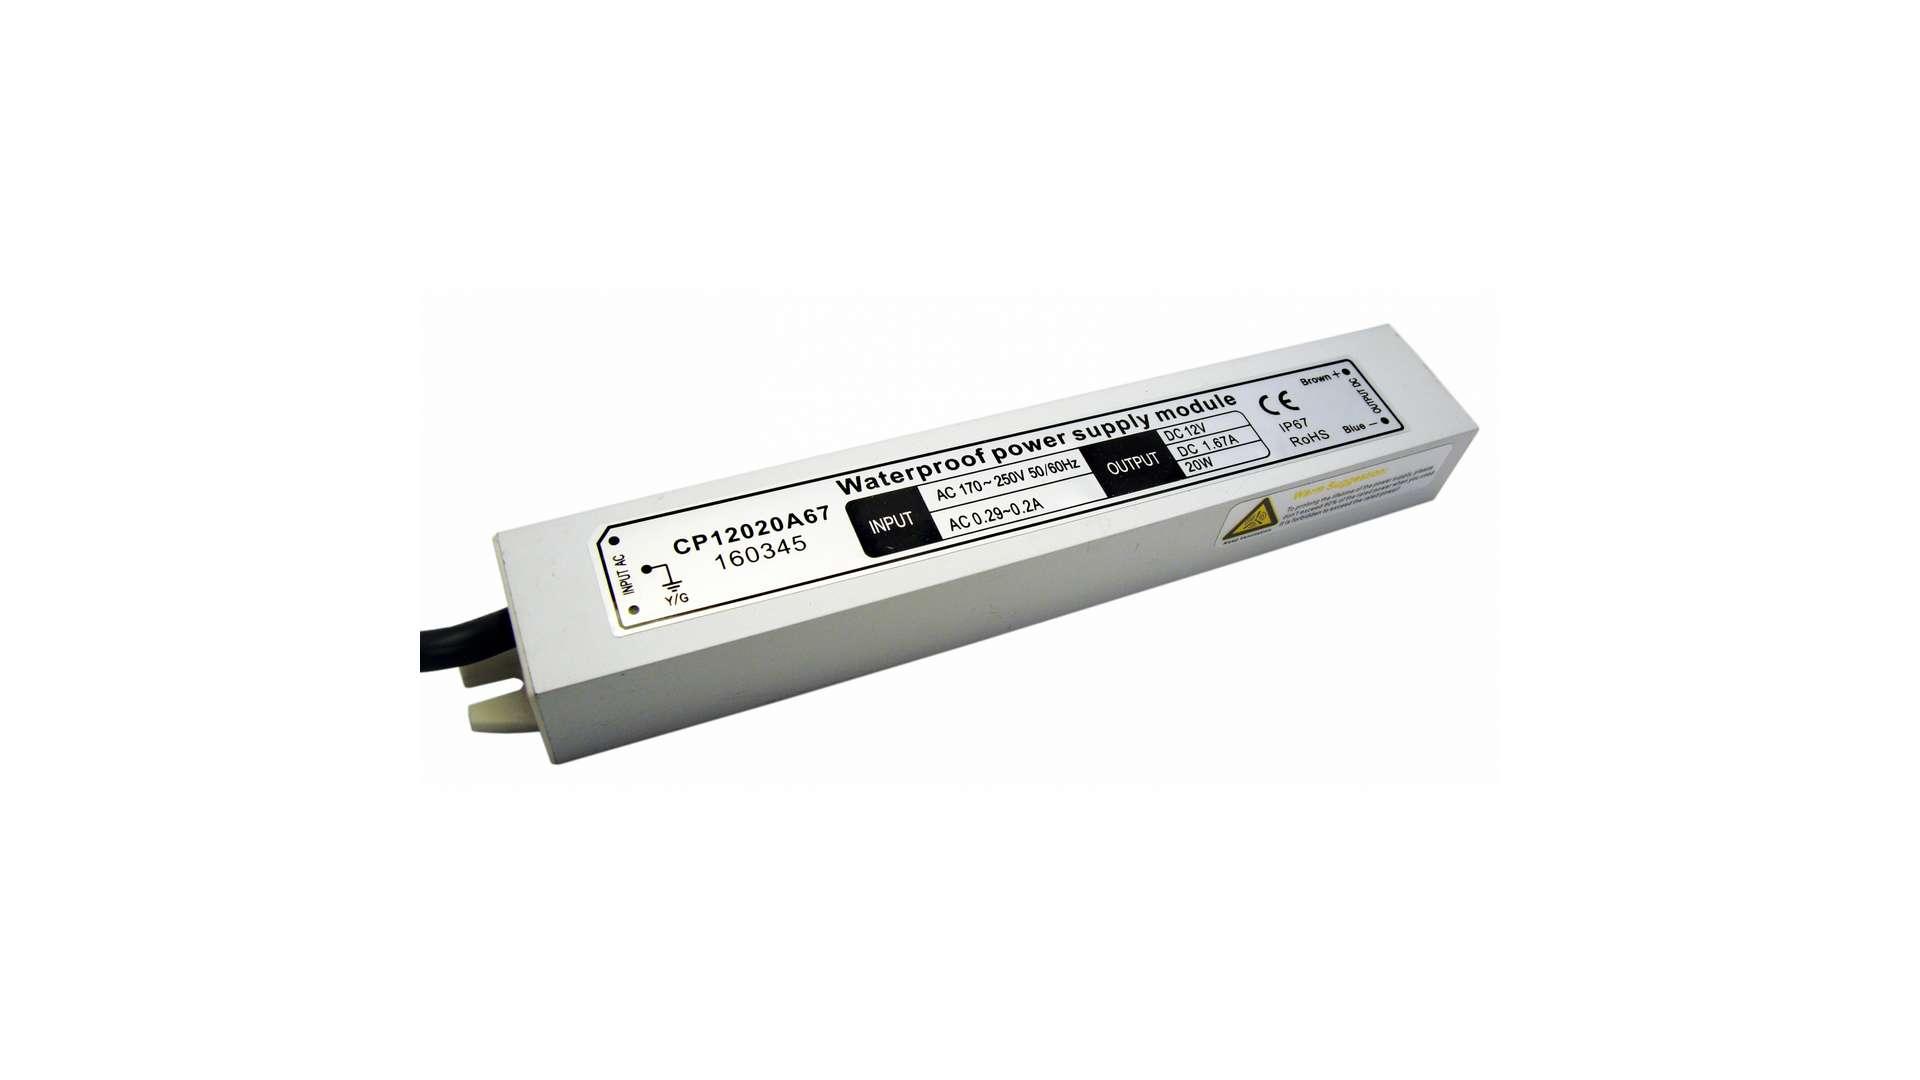 12V 20W IP67 metal case power supply